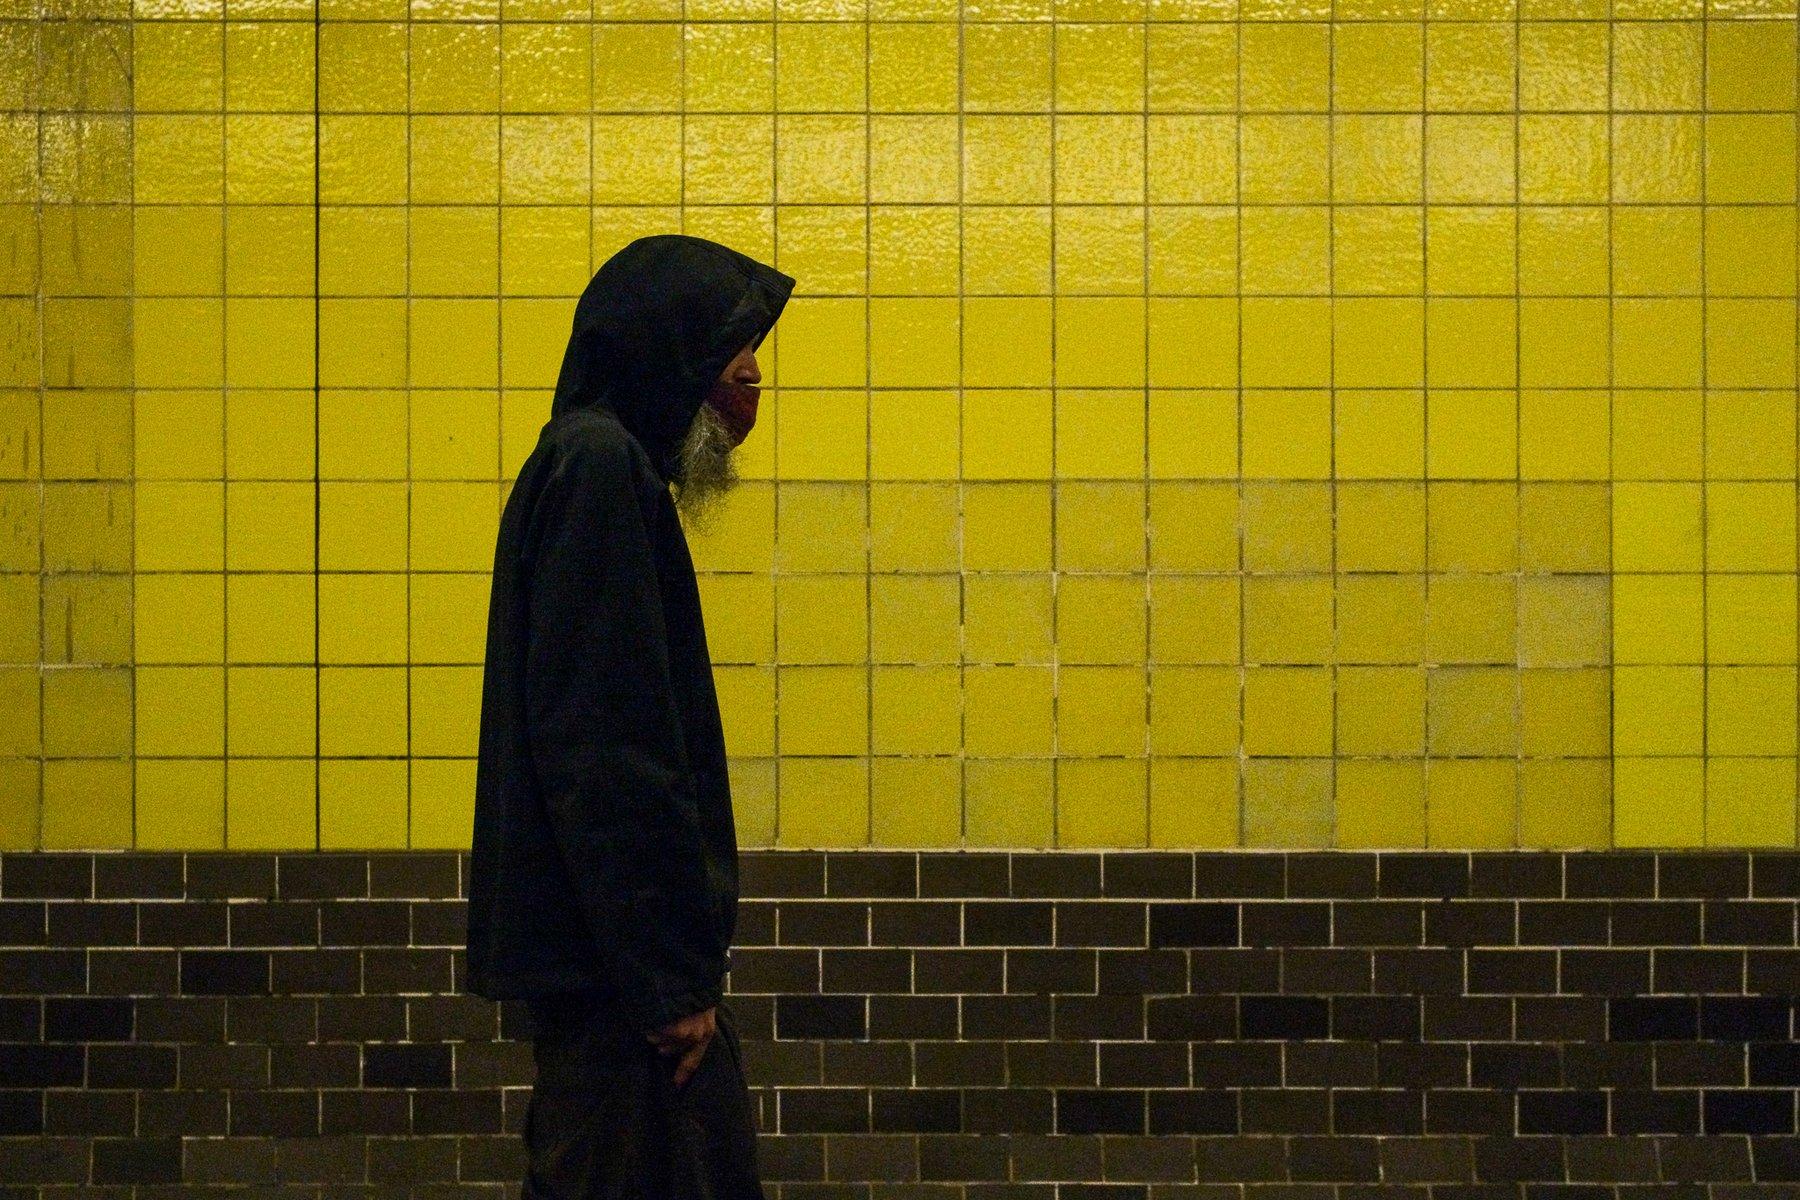 Jean-Pierre Damen urban and street photography - 06_L1002820-2.jpg